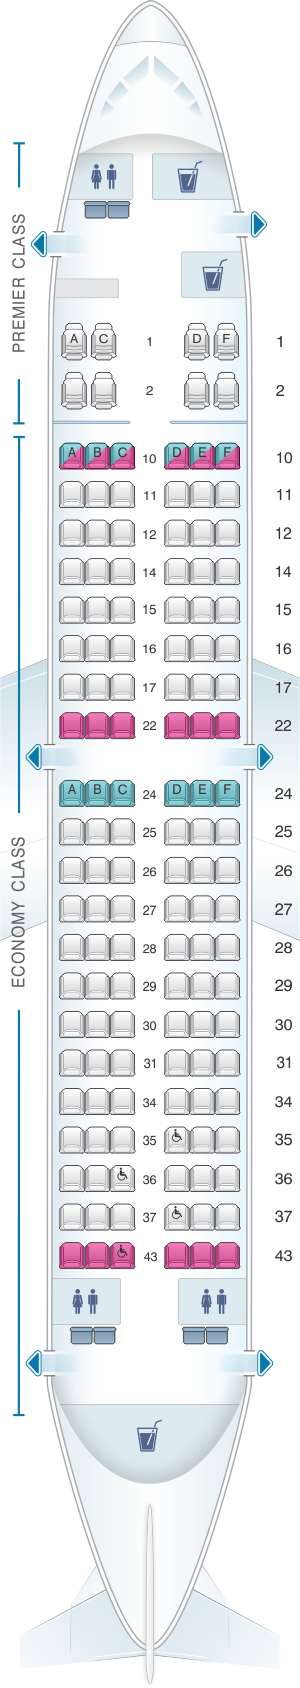 Seat map for Jet Airways Boeing B737 700 134PAX